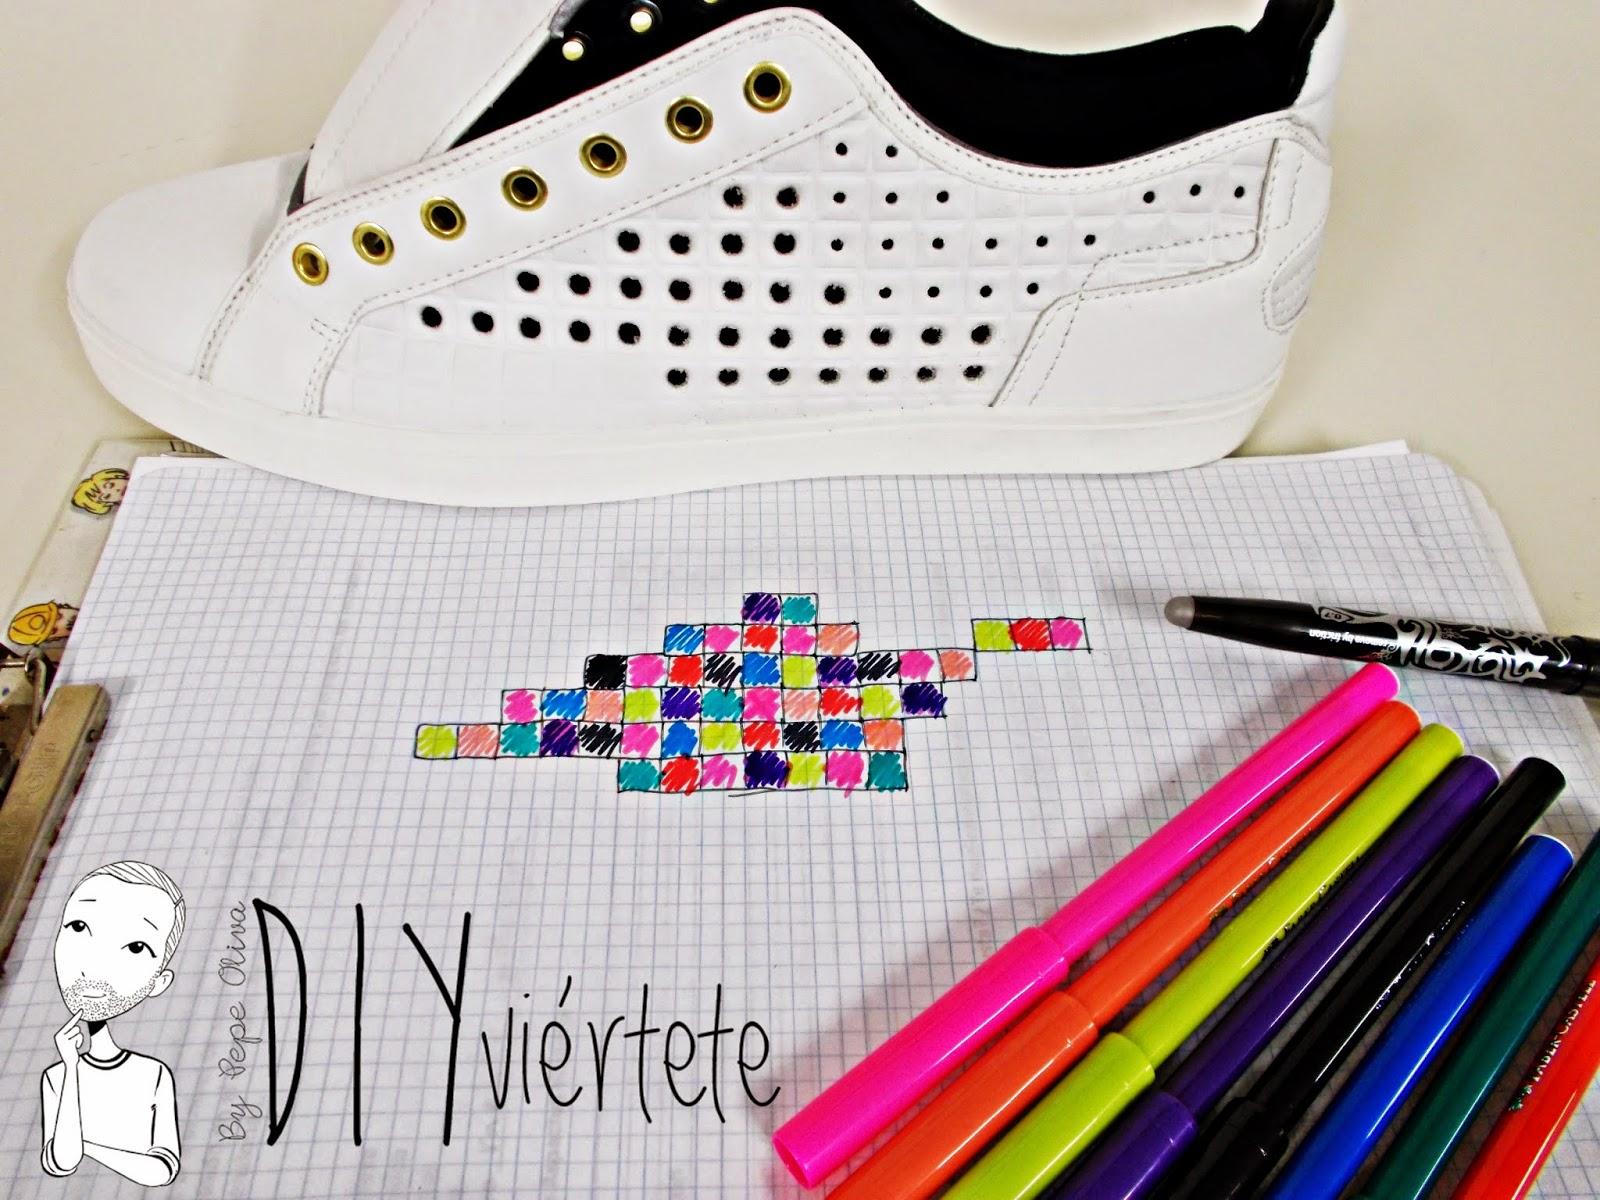 DIY-zapatillas-tunear-customizar-CHRISTIAN-LOUBOUTIN-zapatos-pinchos-esmaltes-pinta uñas-colores-9